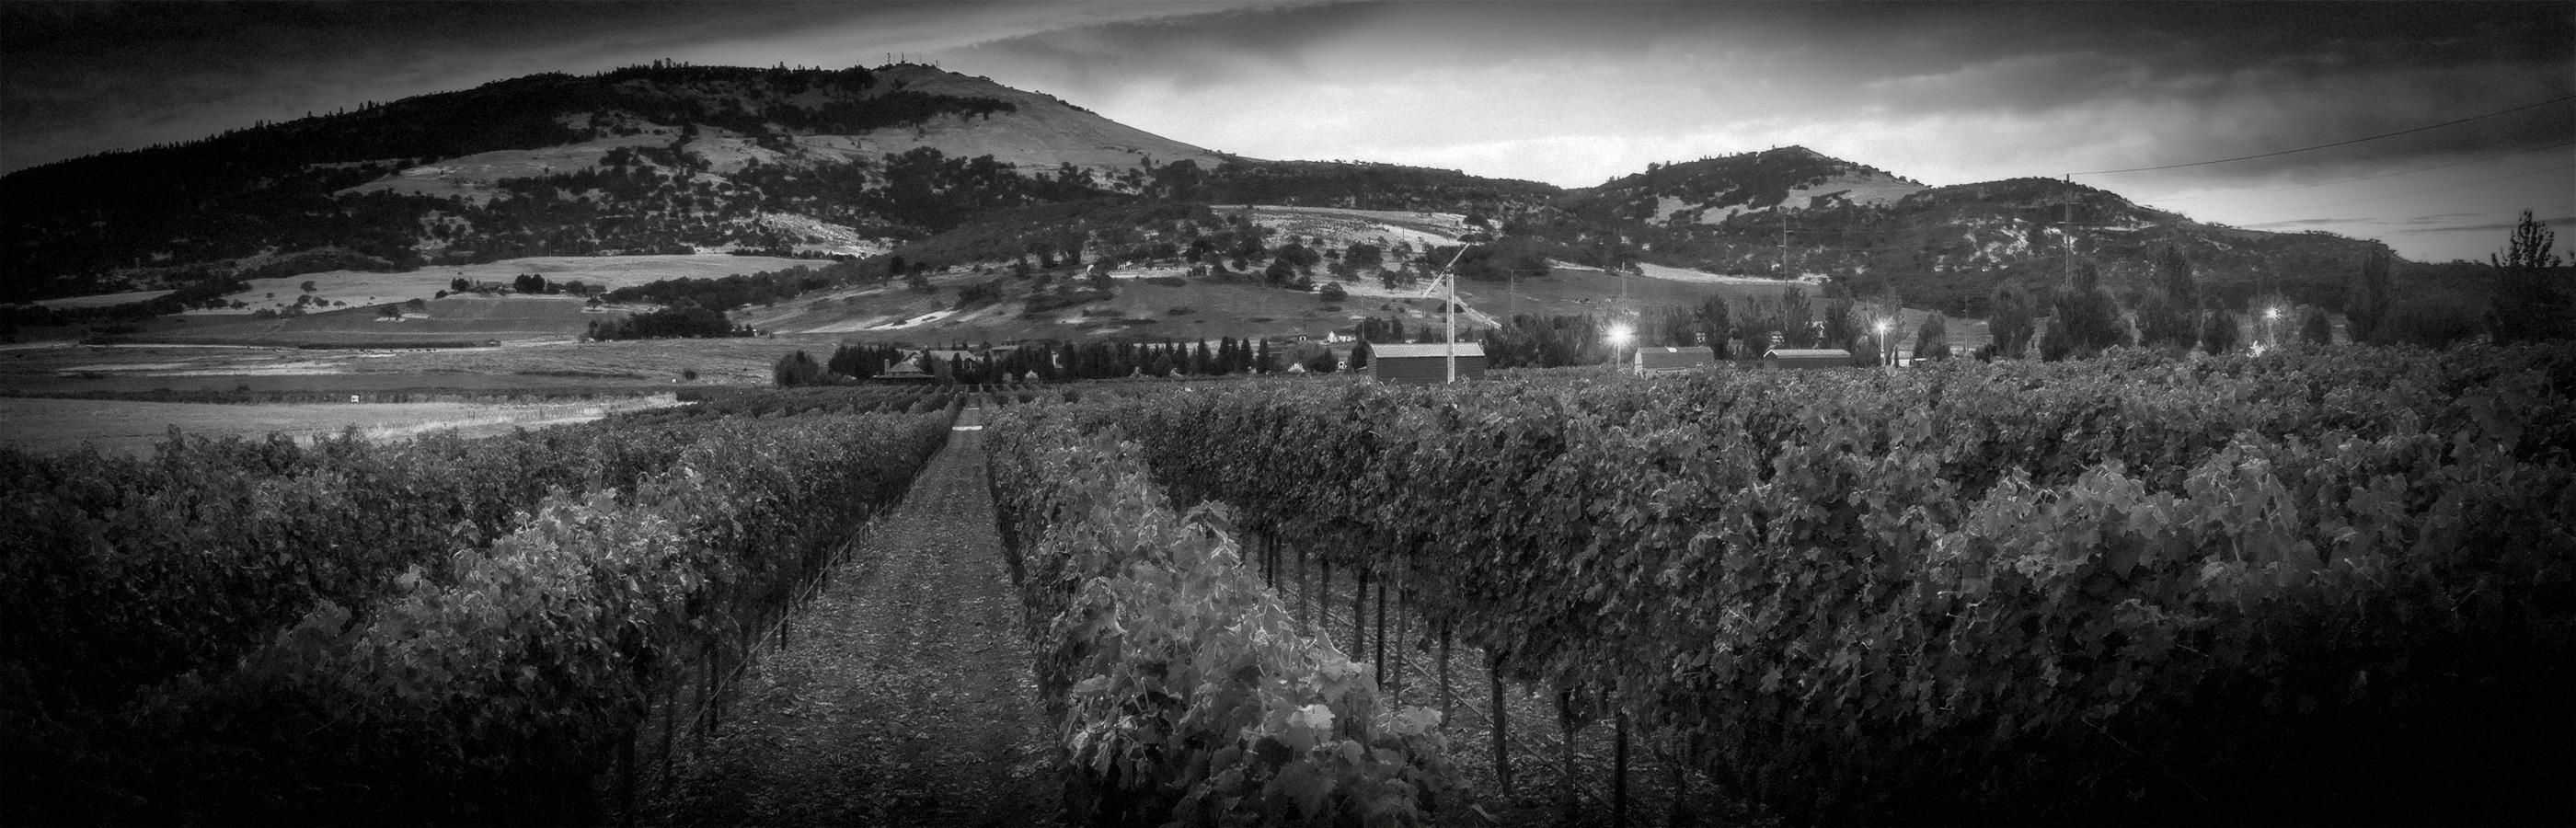 2Hawk Vineyard and Winery Vineyard at Sunset (Grayscale)